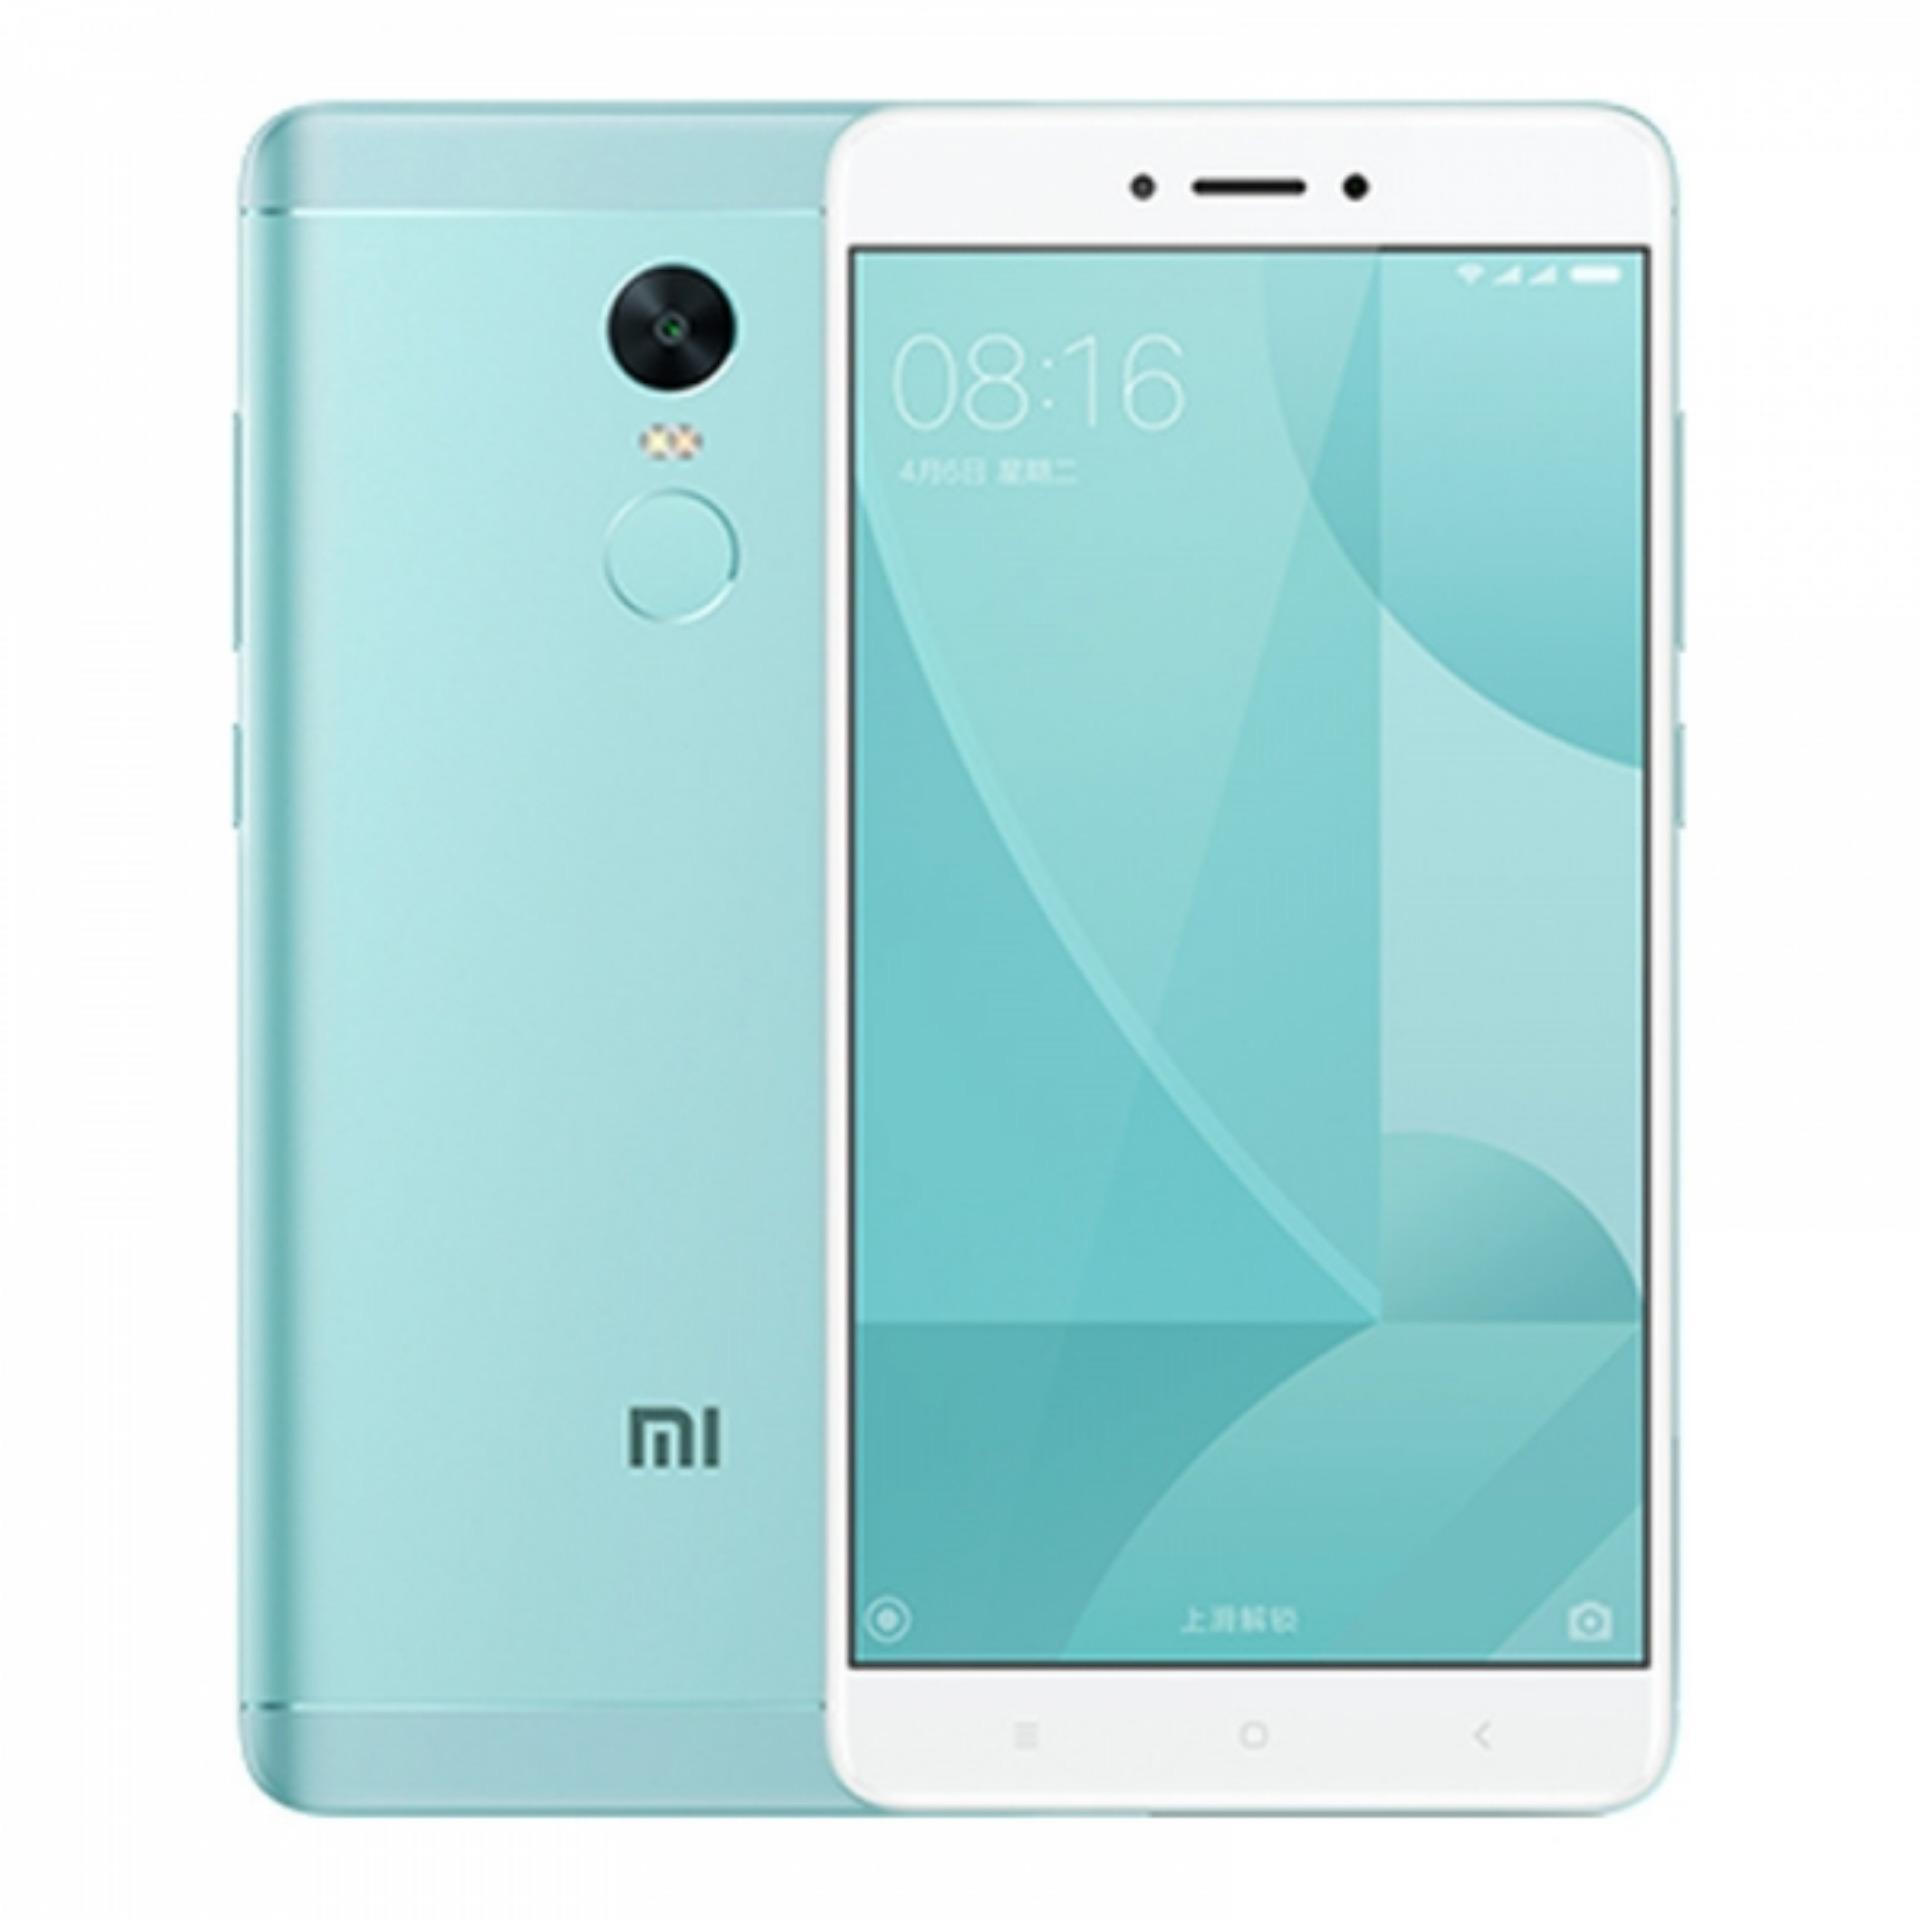 Xiaomi Redmi Note 4x ( 3GB / 32GB ) BLUE GREEN HATSUNE MIKU